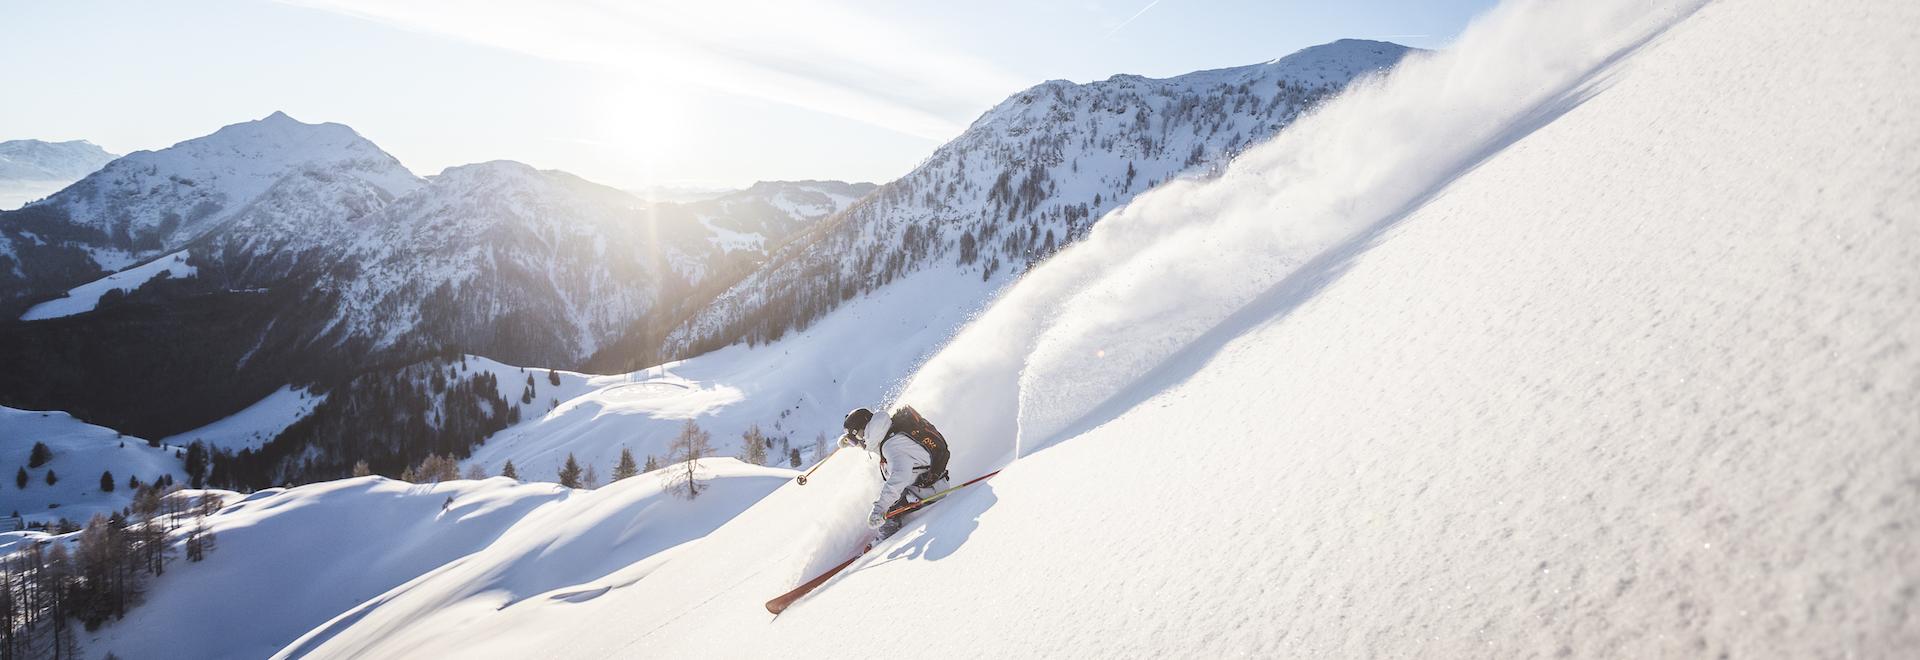 Ski in Saalbach Hinterglemm